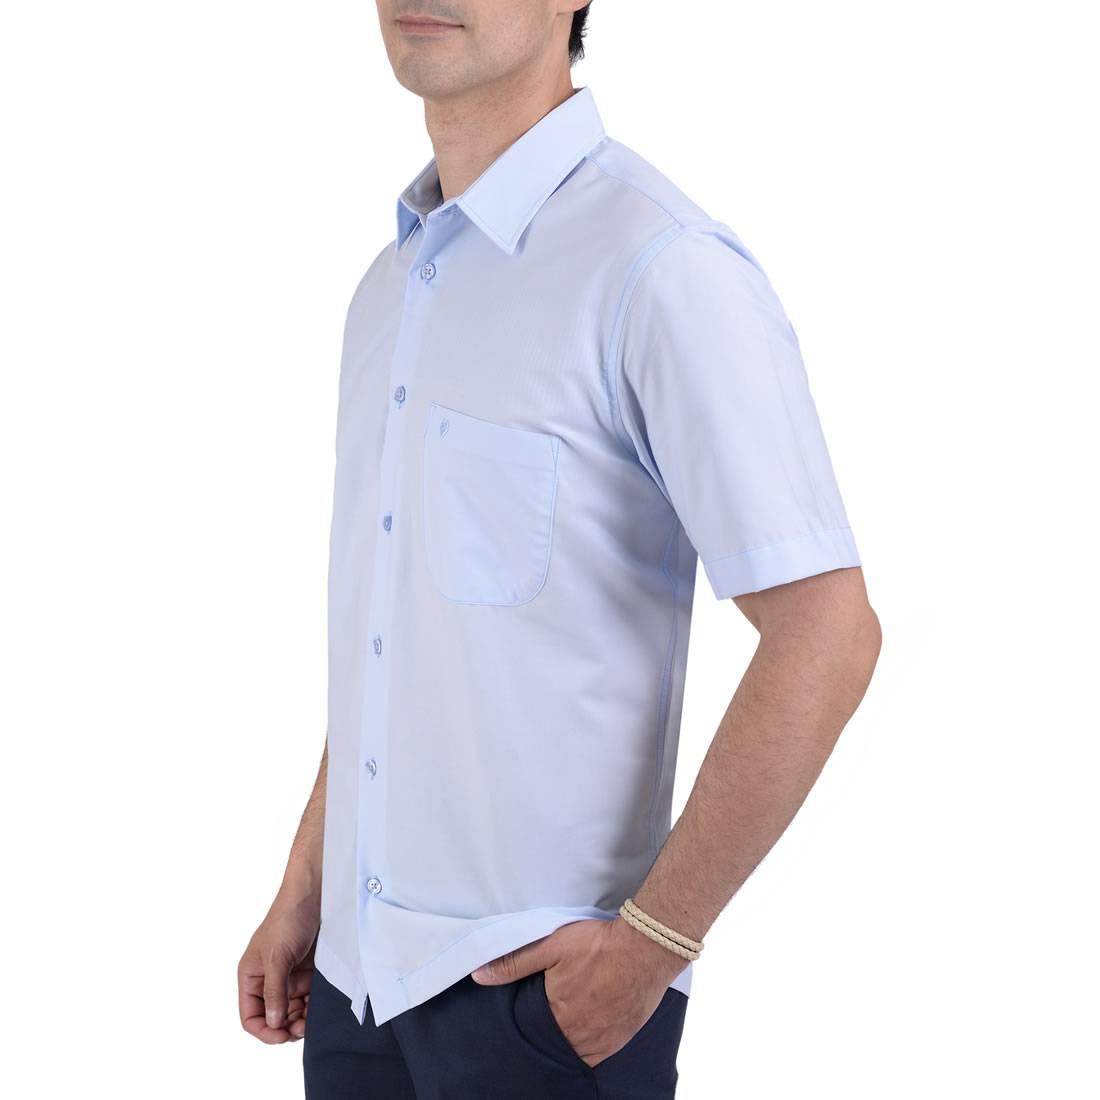 042379432110-02-Camisa-Casual-Manga-Corta-Classic-Fit-Azul-yale